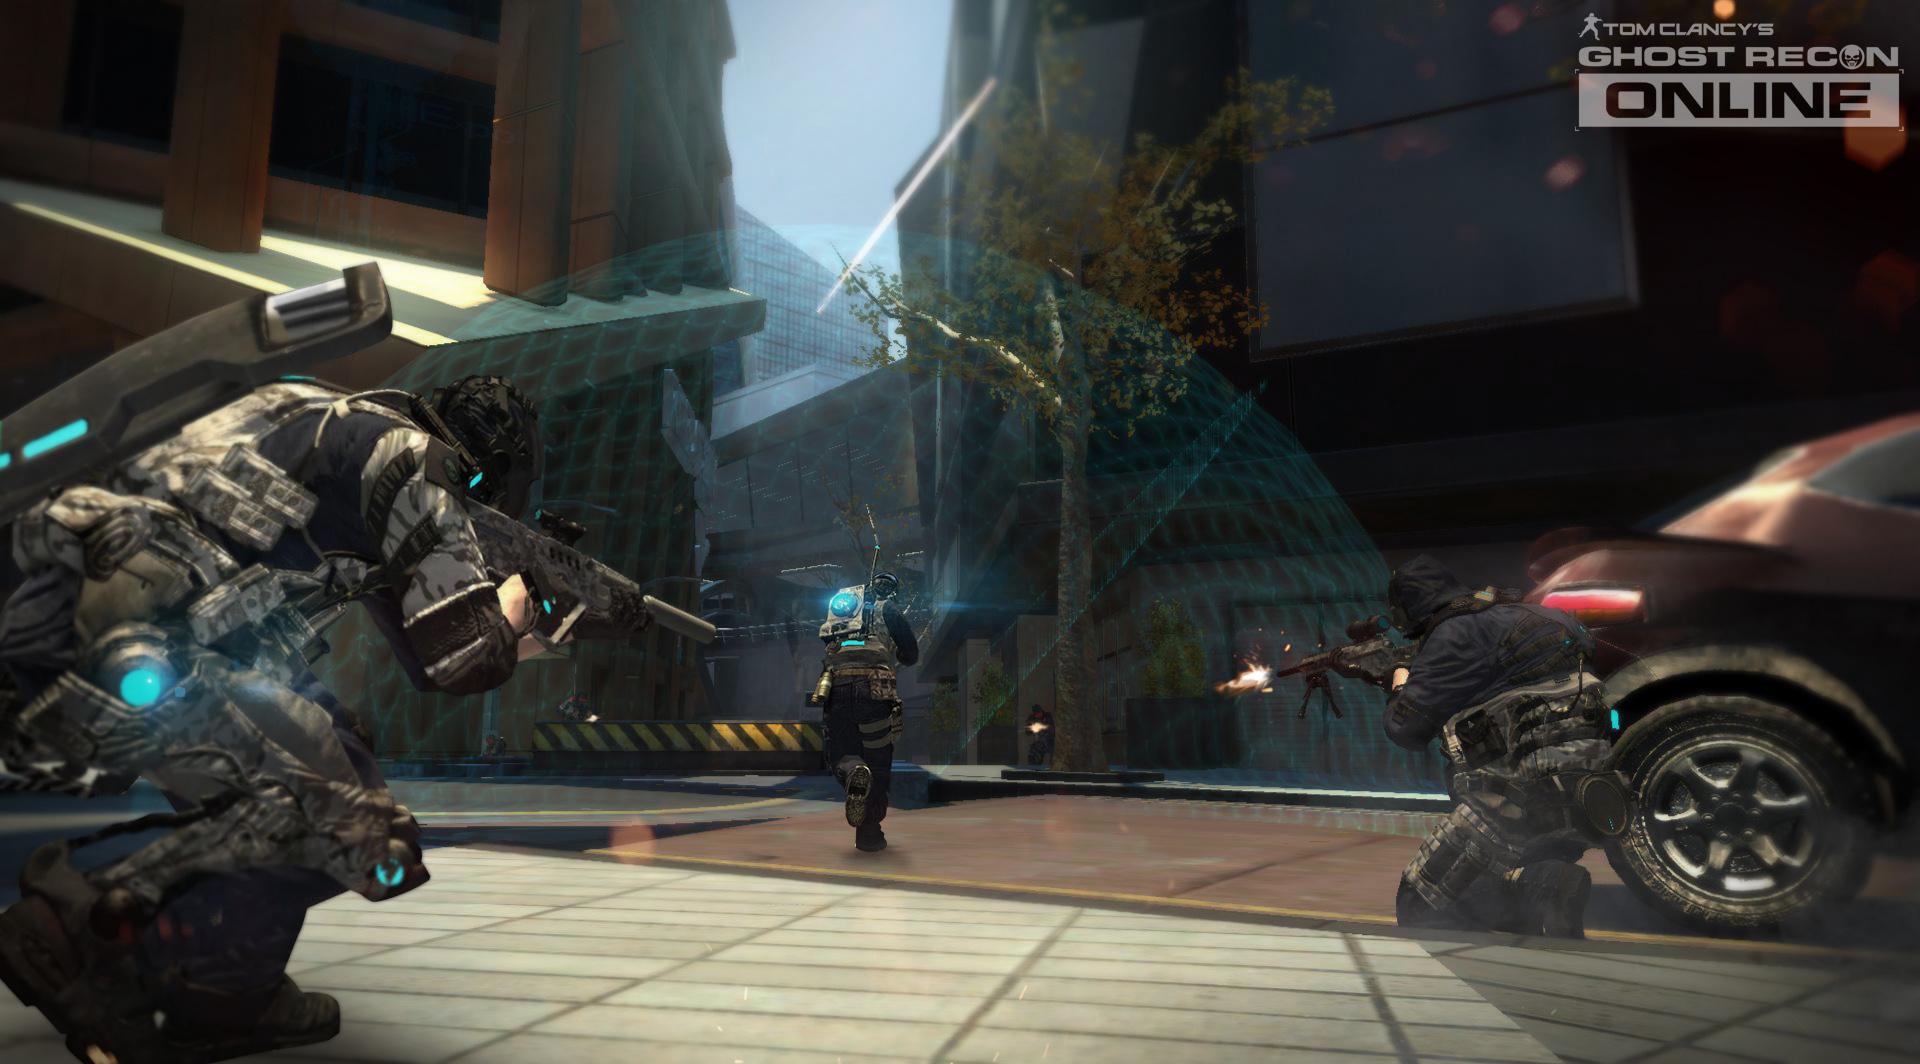 Enter the Phantoms Screenshot 3